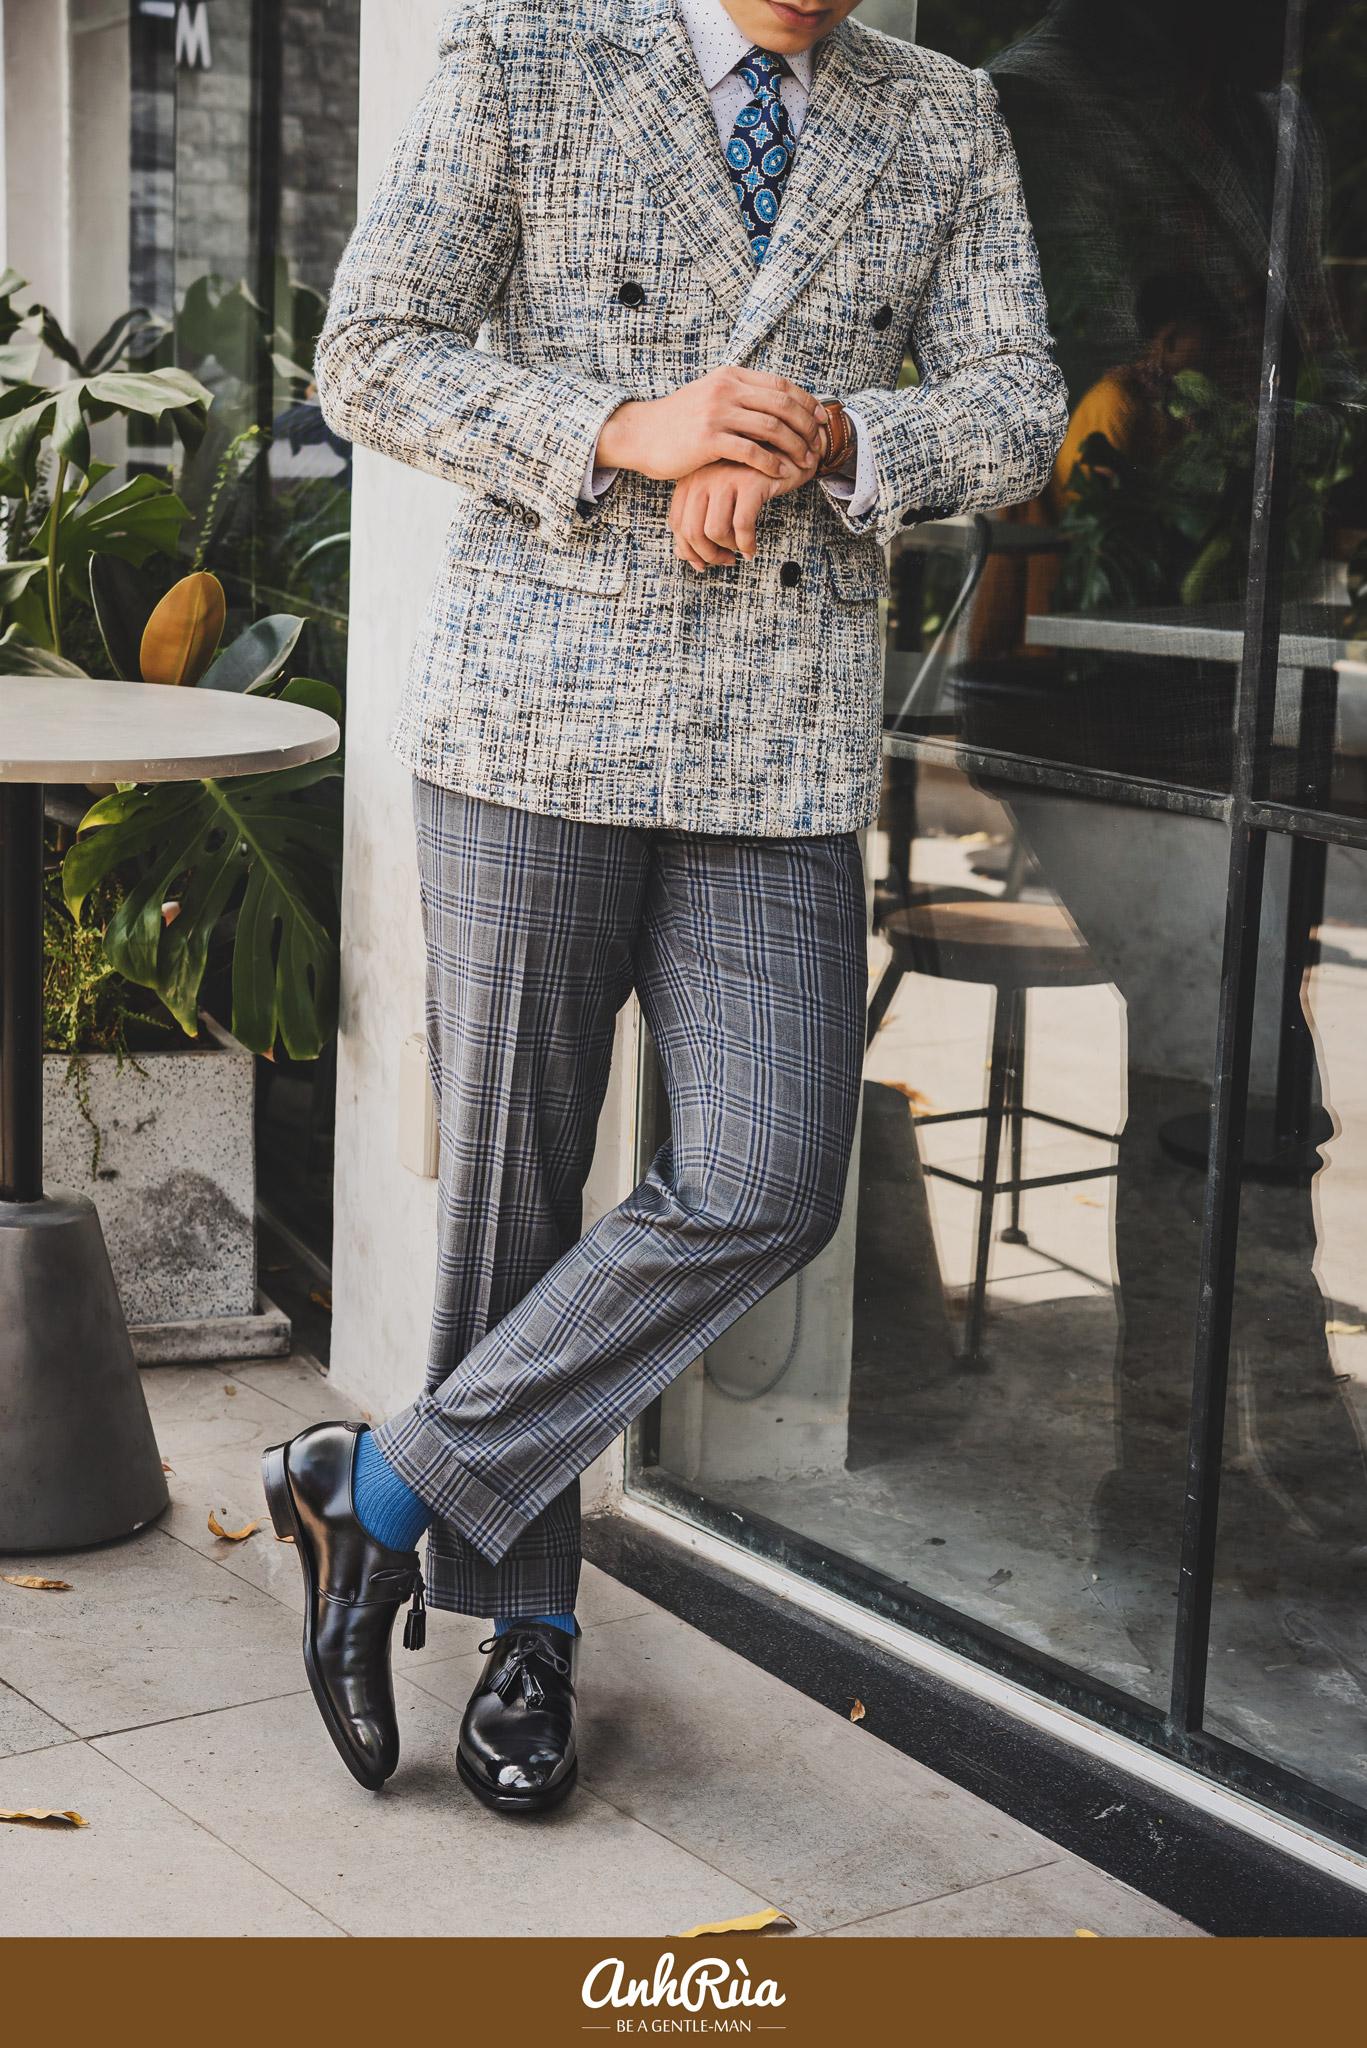 Box calf dress shoes Crockett & Jones